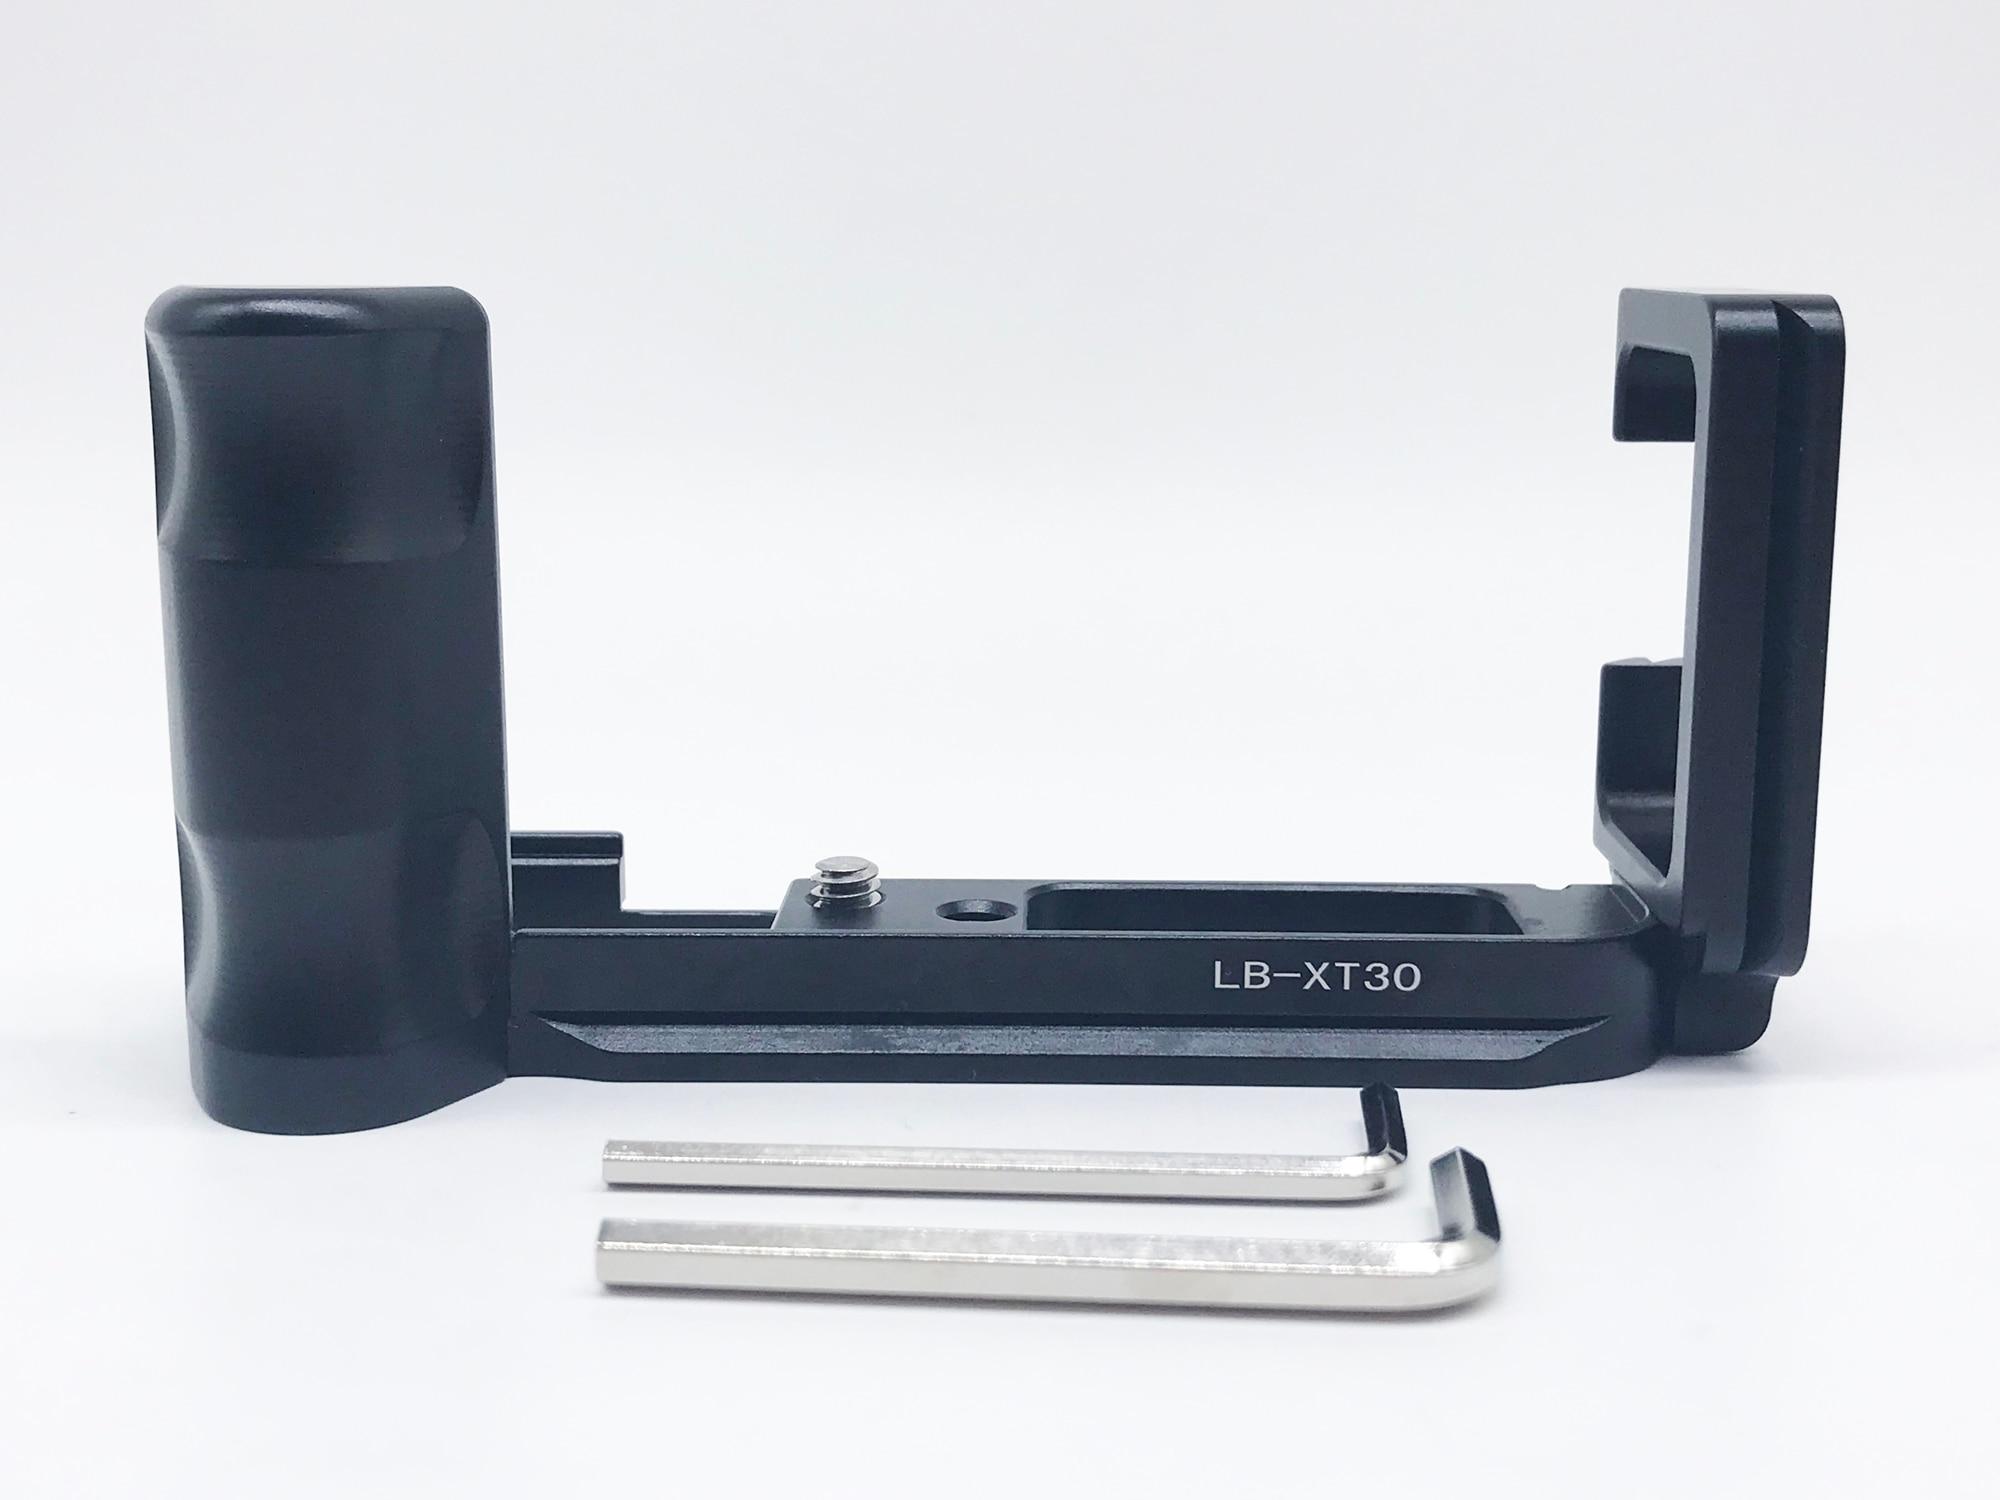 Xt30 Vertical de liberación rápida L placa/soporte adaptador de agarre de mano para Fujifilm Fuji X-T30 RRS SUNWAYFOTO markin